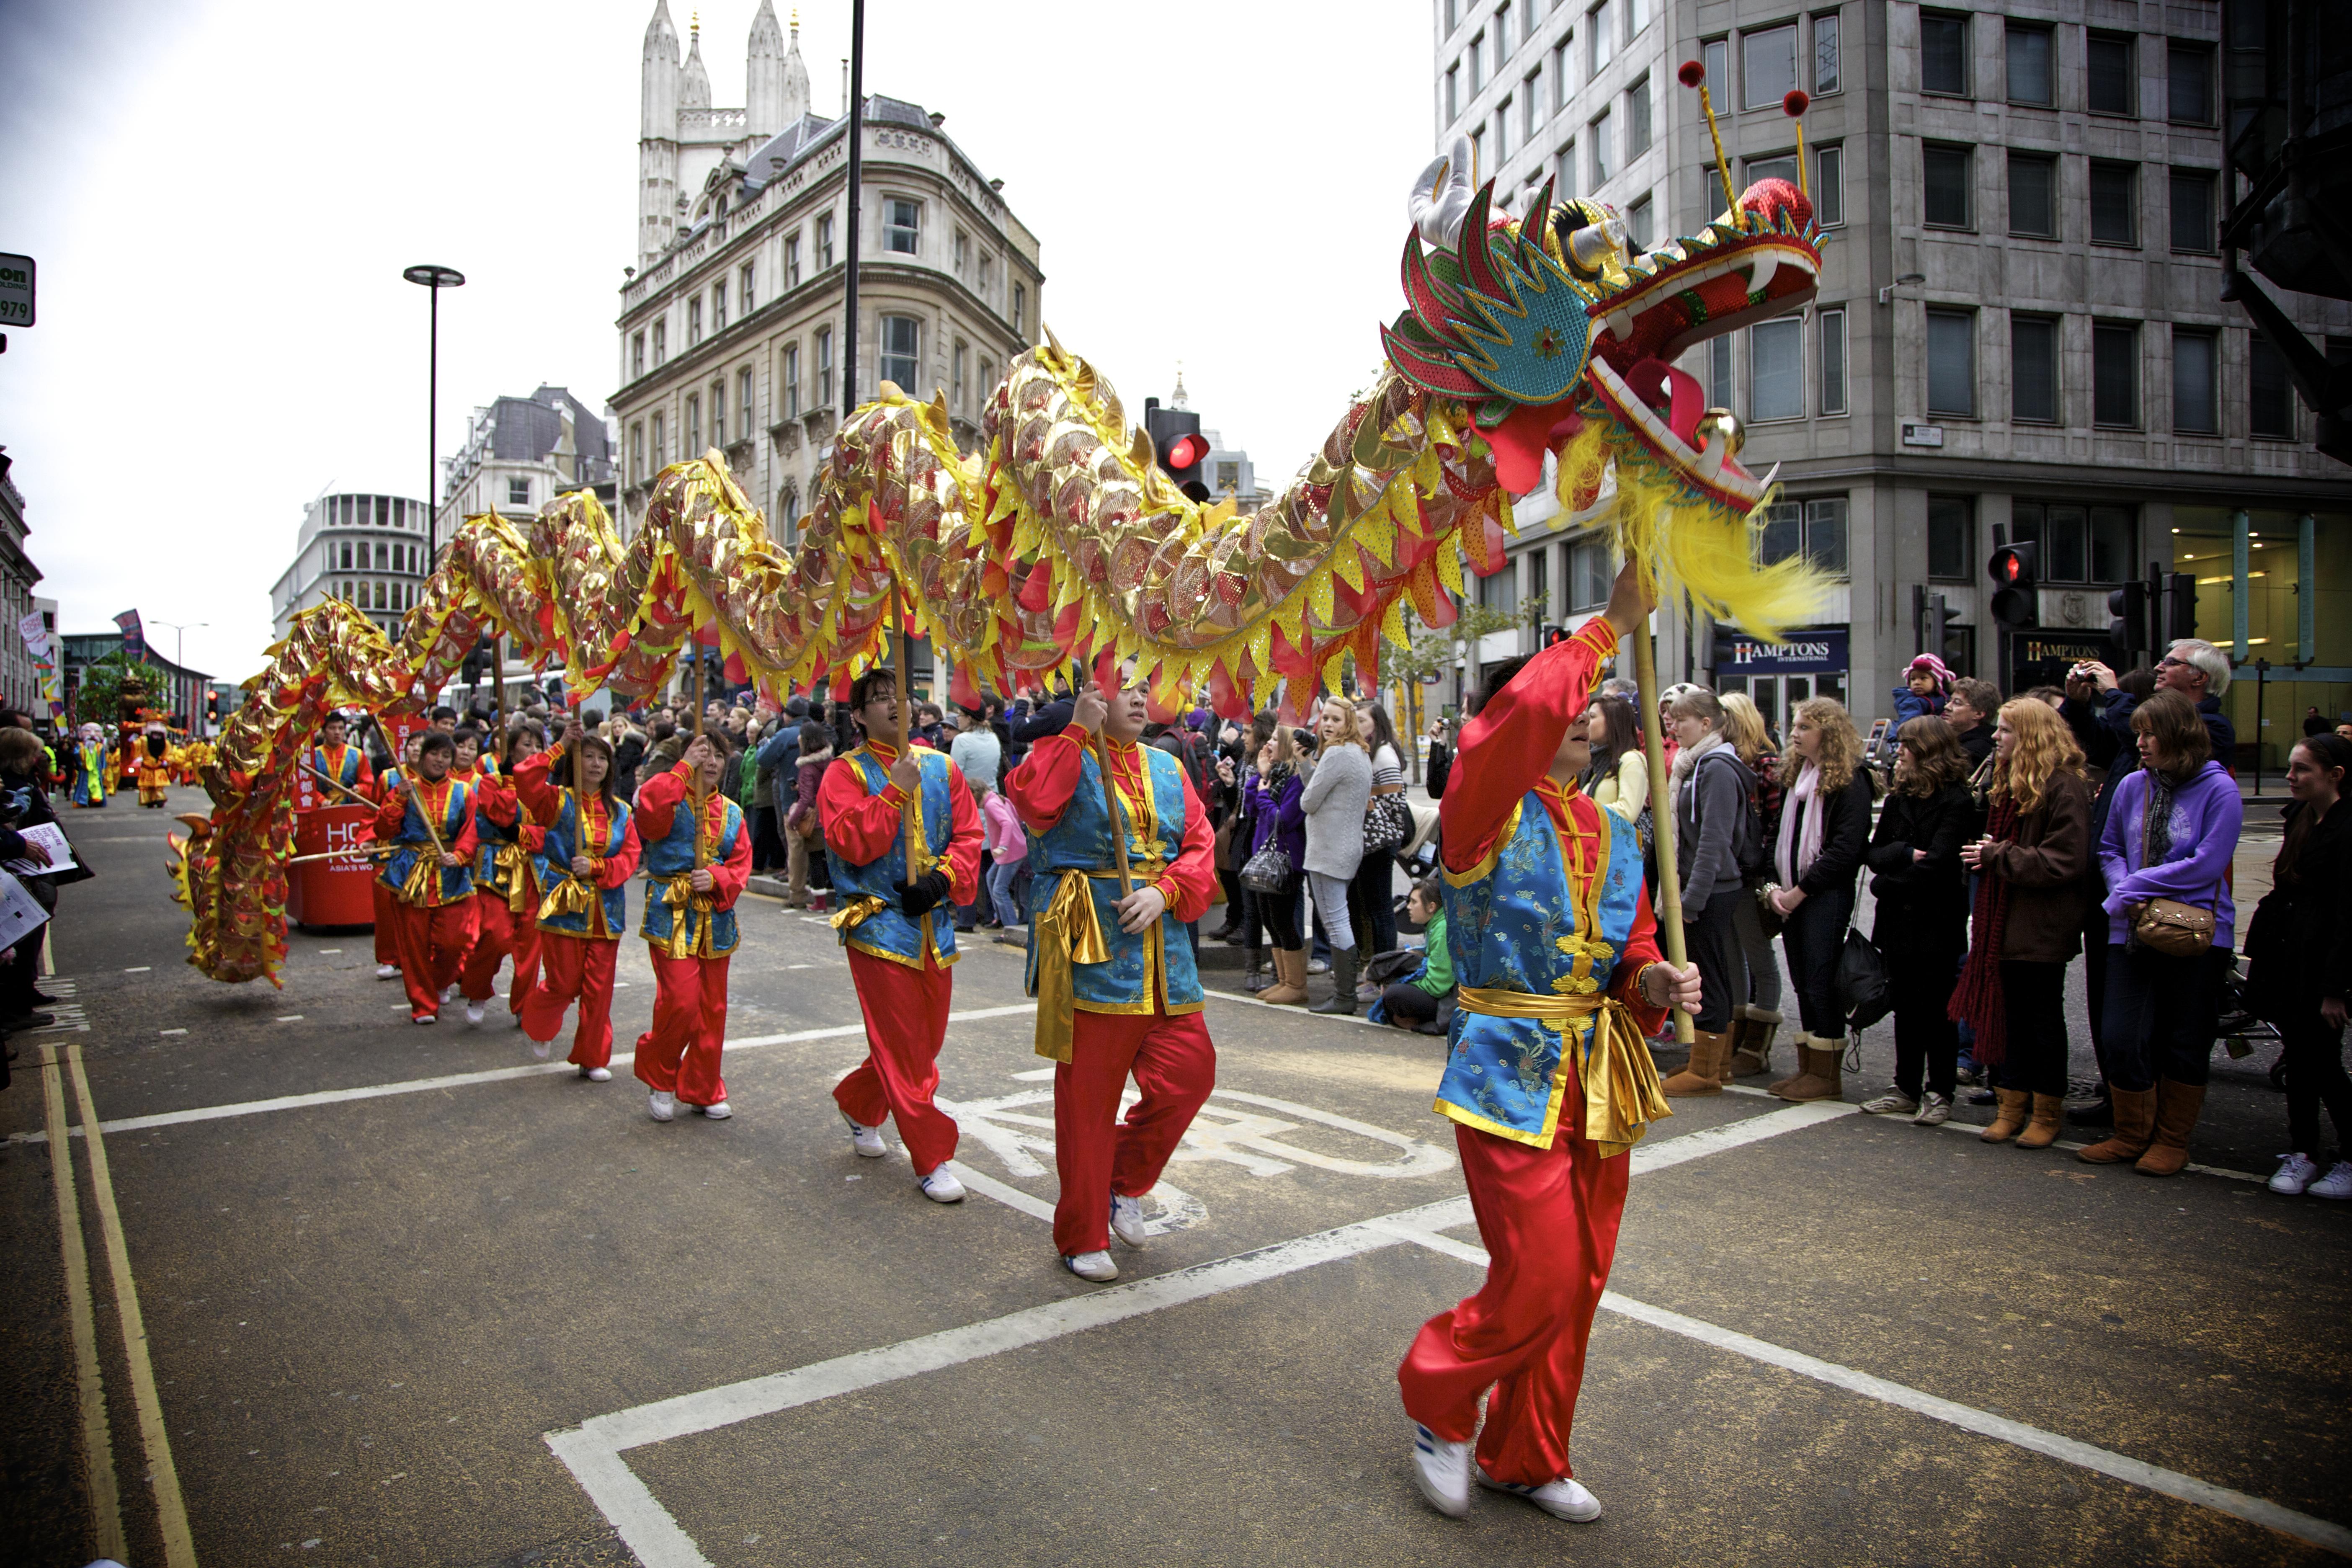 File:Lord Mayor's Show 2010 dragon.jpg - Wikimedia Commons